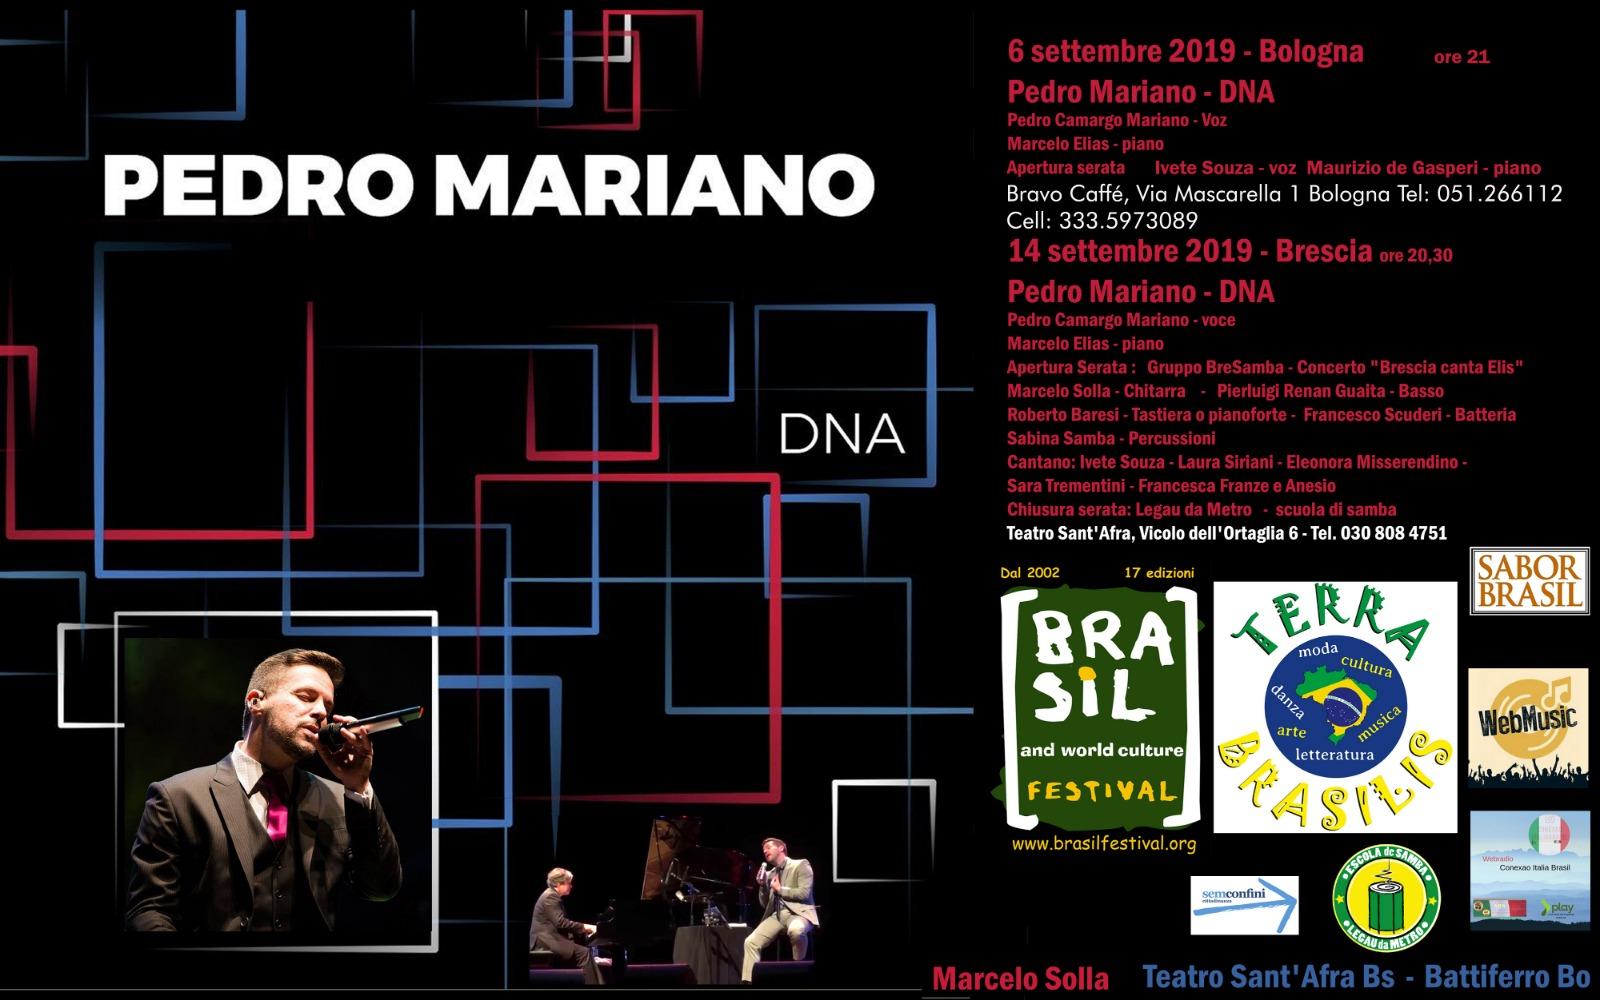 Pedro Mariano-Bravo Caffe | Brasilfestival.org